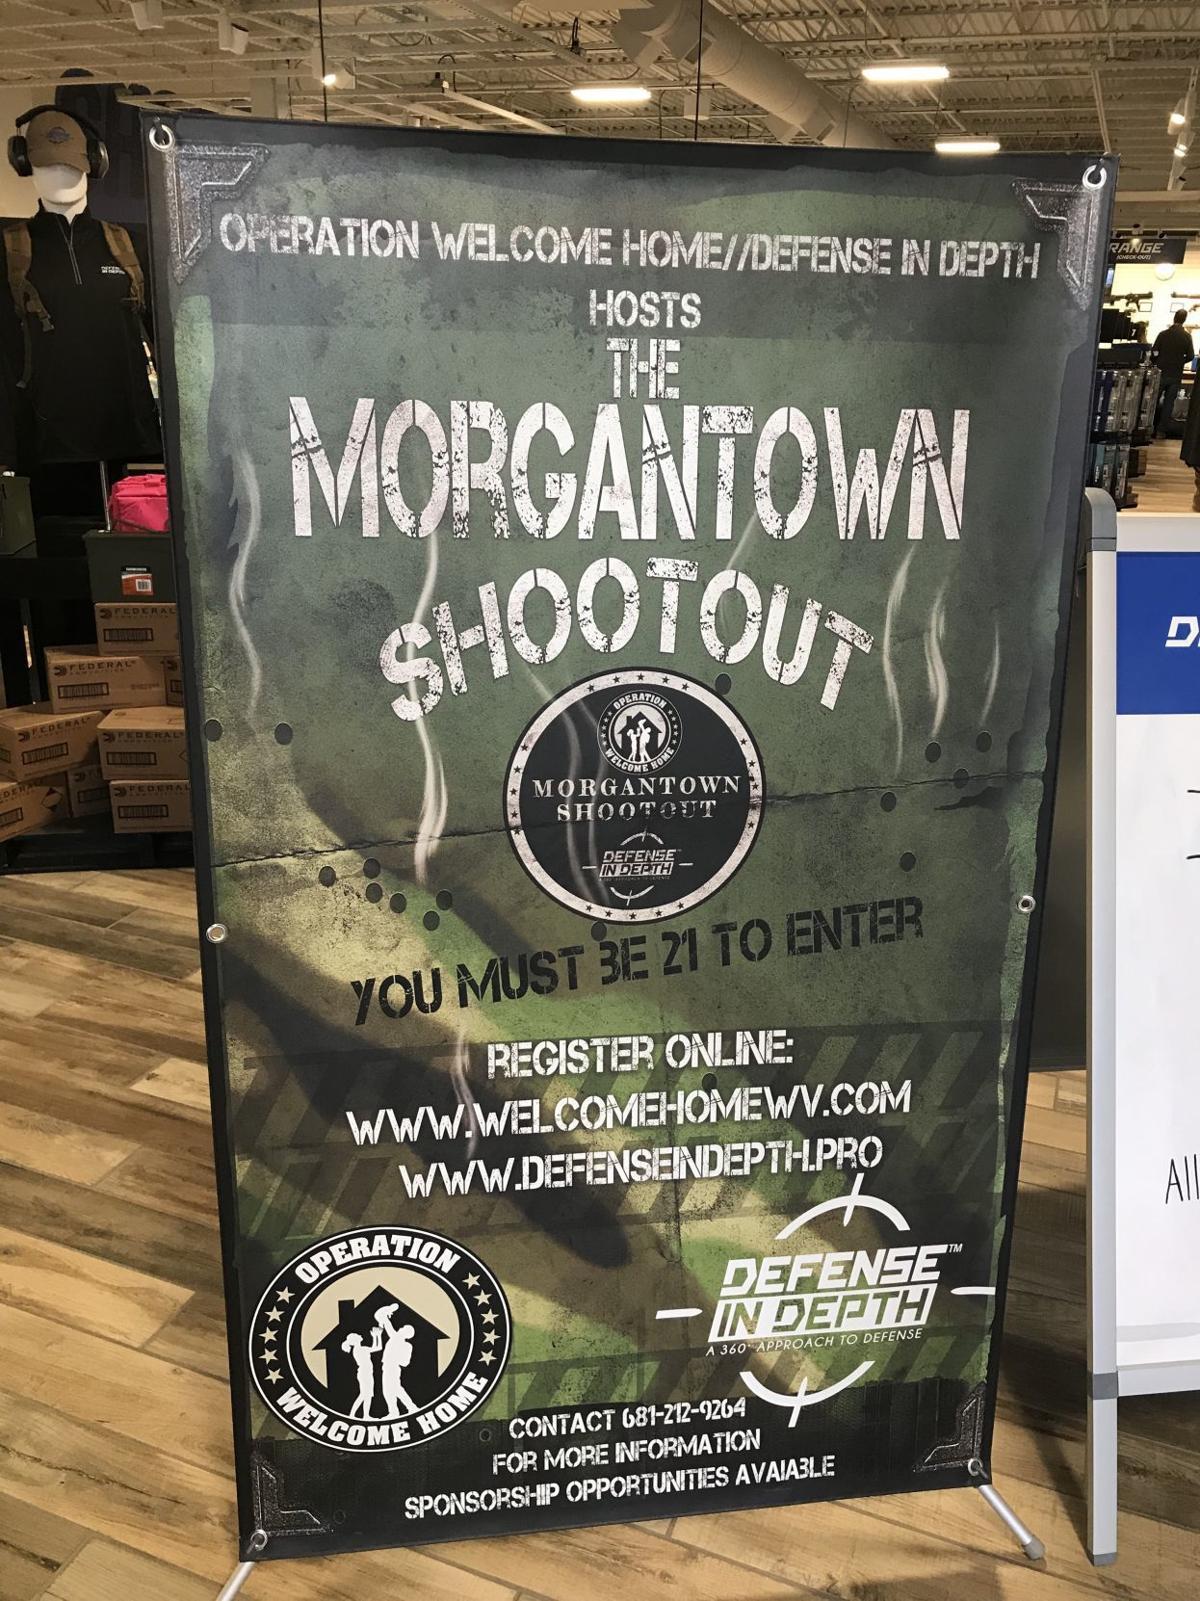 Morgantown Shootout returns